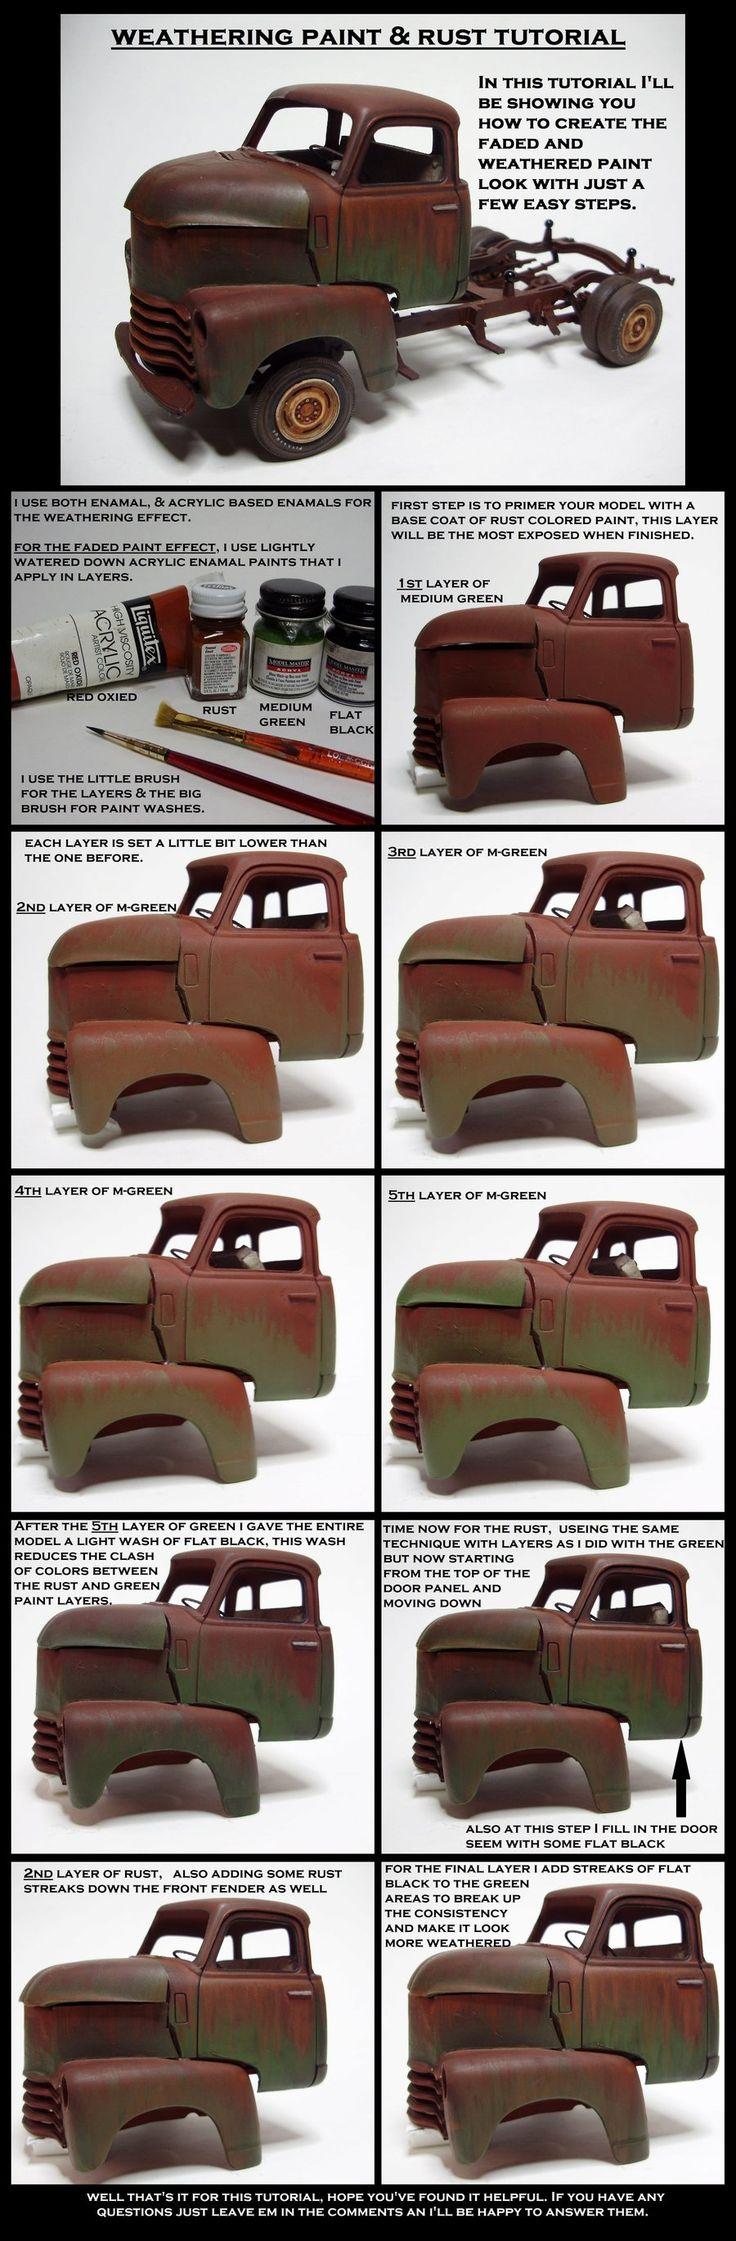 weathering paint an rust tutorial by devilsreject493.deviantart.com on @DeviantArt